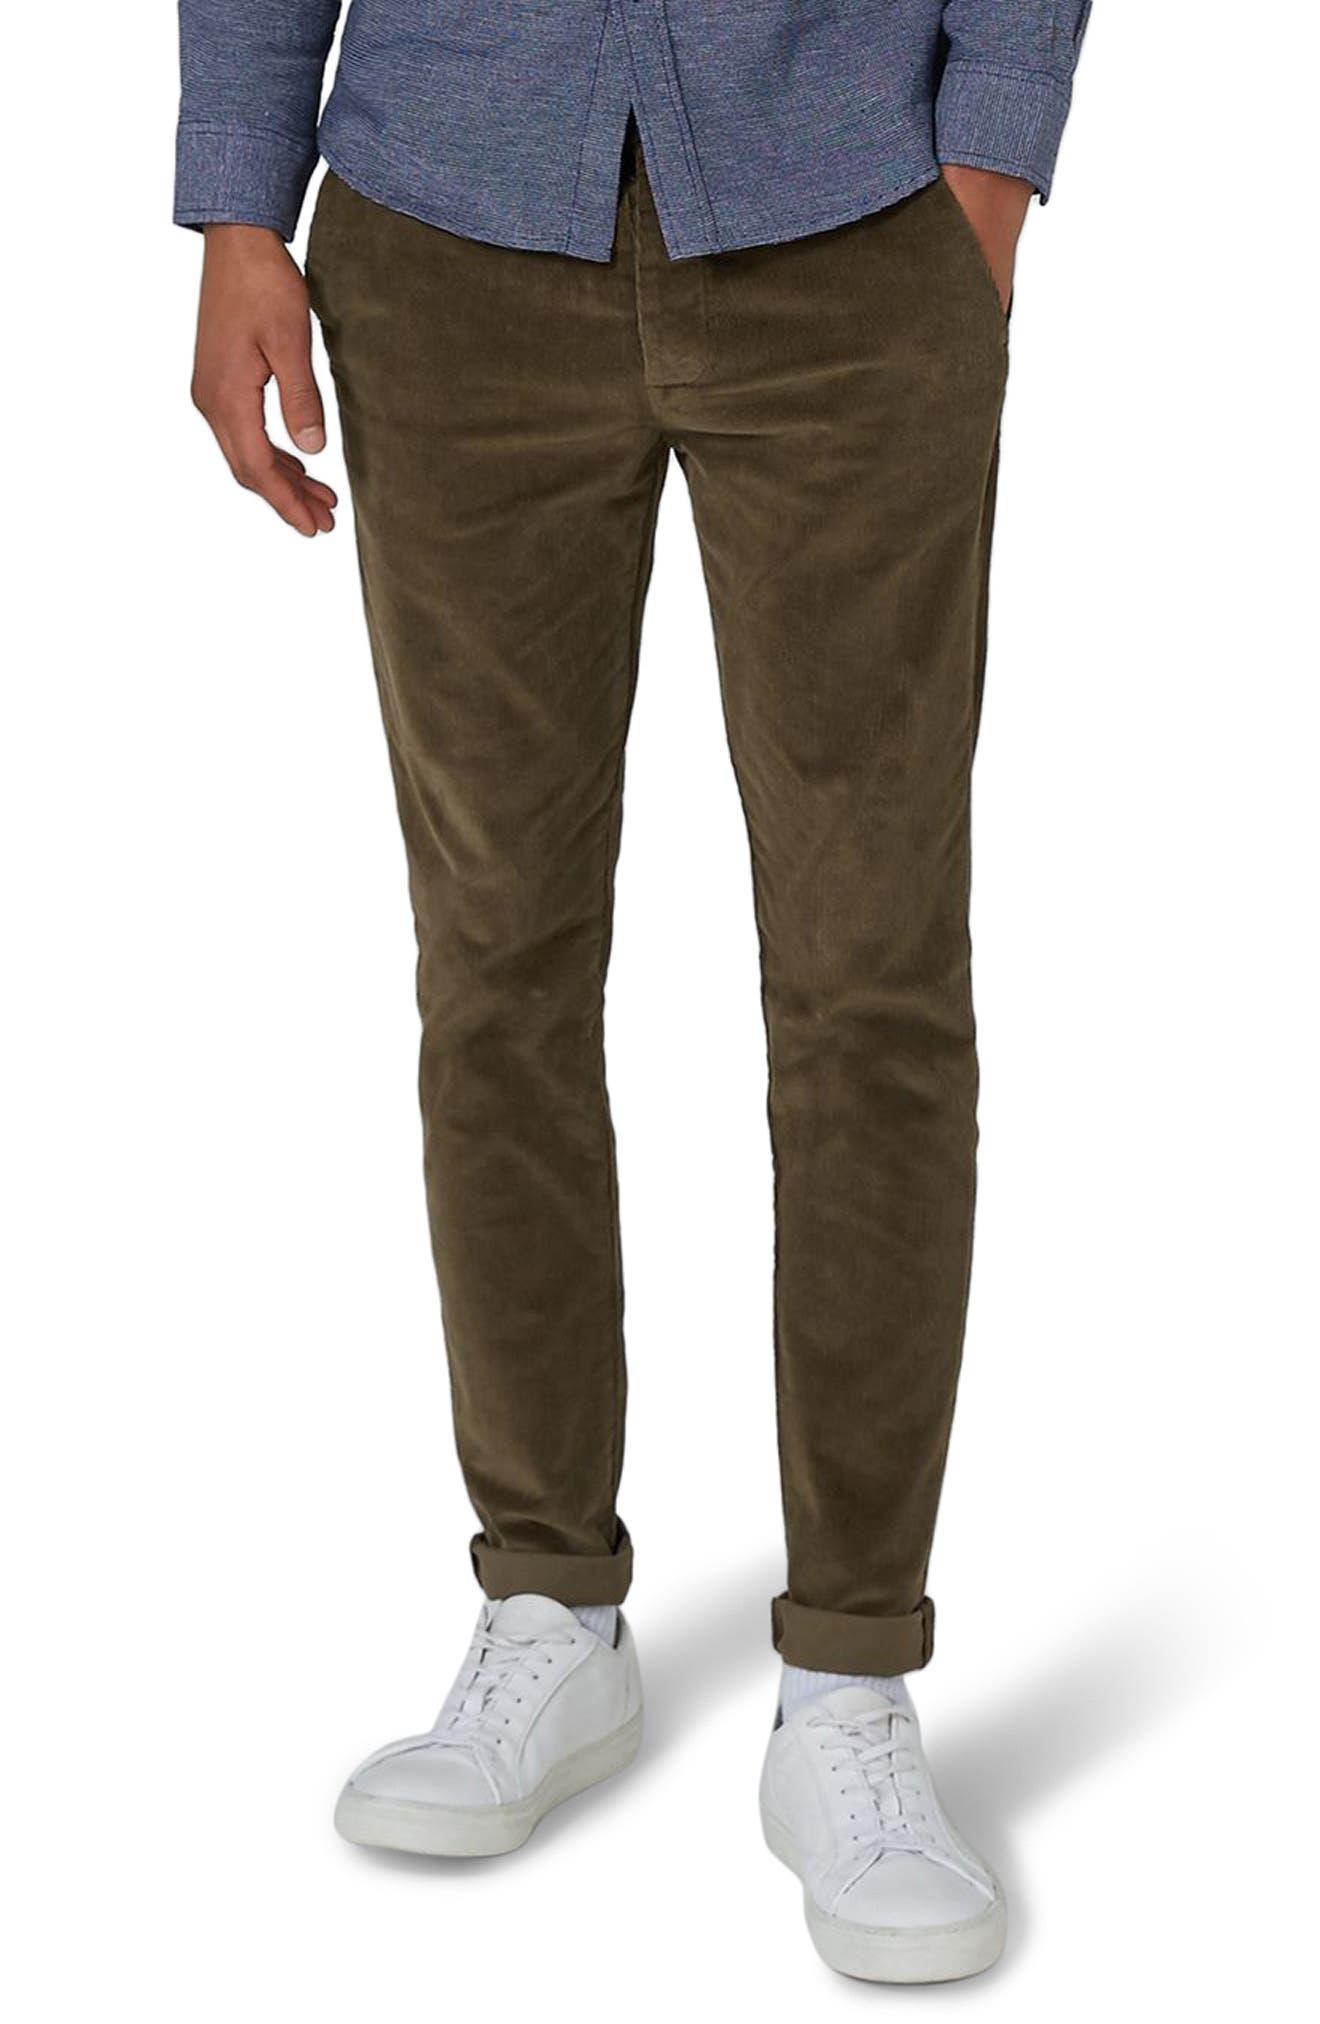 Topman Skinny Fit Corduroy Trousers